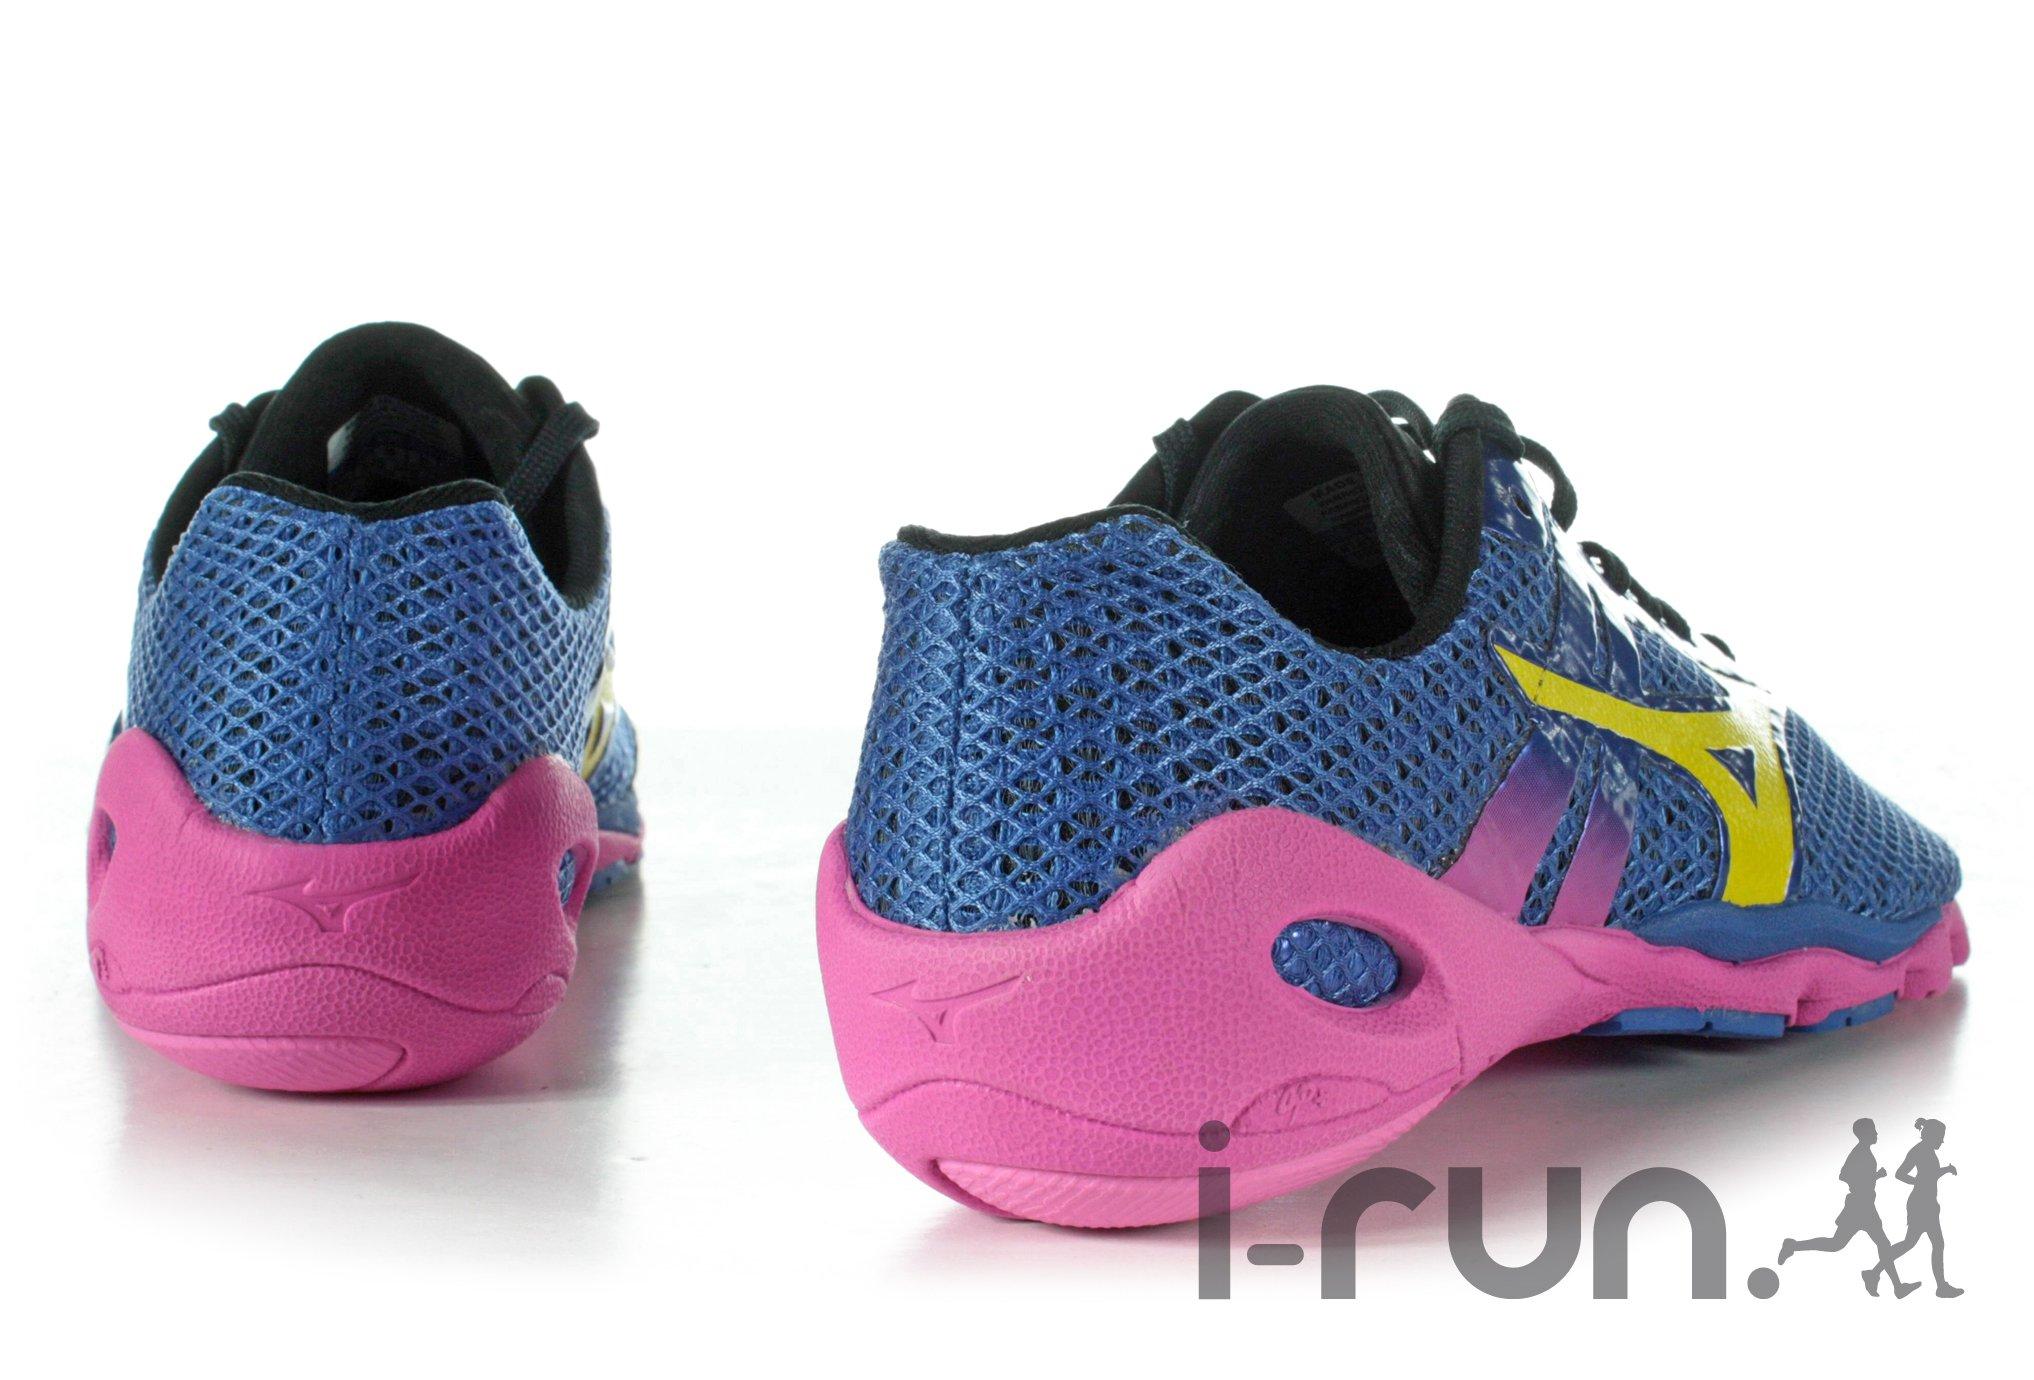 Chaussure de course minimaliste avis - Labrocantederosalie.fr 946810ec33b